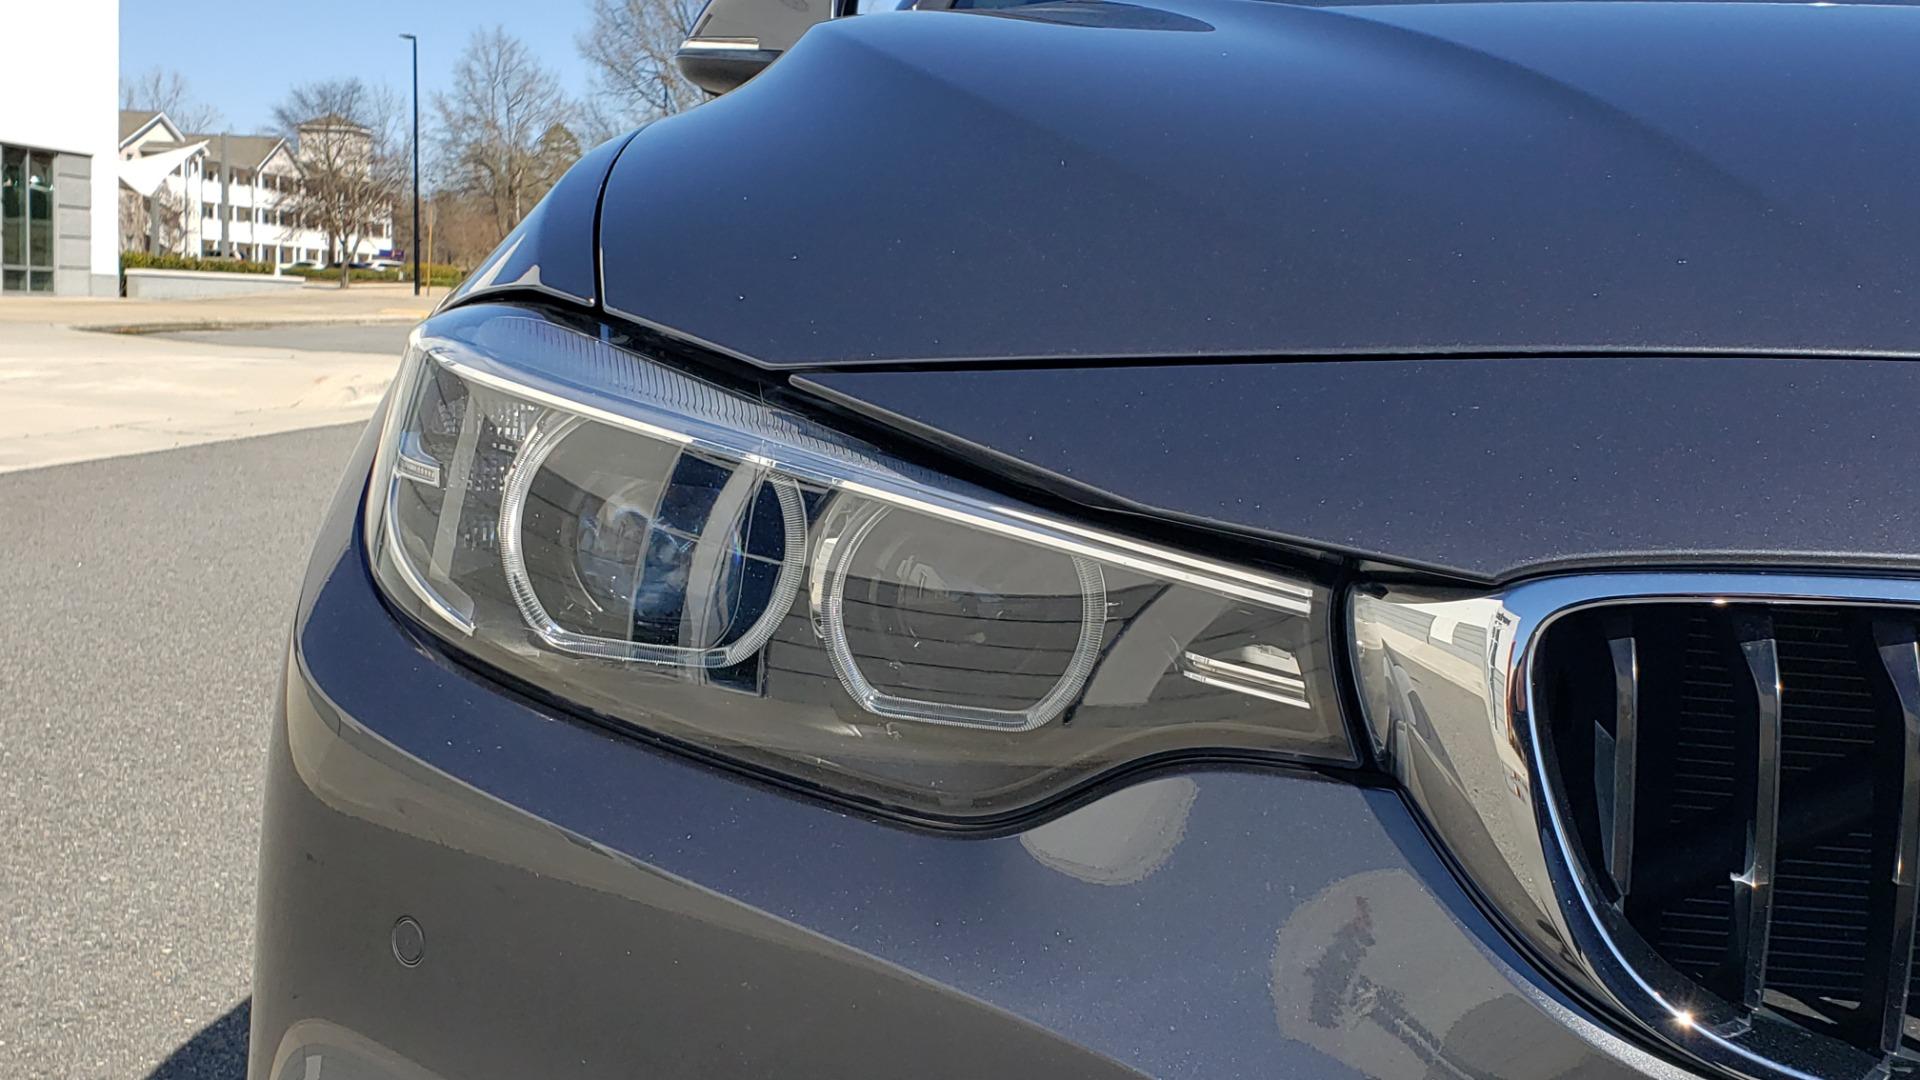 Used 2018 BMW 4 SERIES 430IXDRIVE / PREMIUM / NAV / SUNROOF / ESSENTIALS PKG for sale $29,495 at Formula Imports in Charlotte NC 28227 27